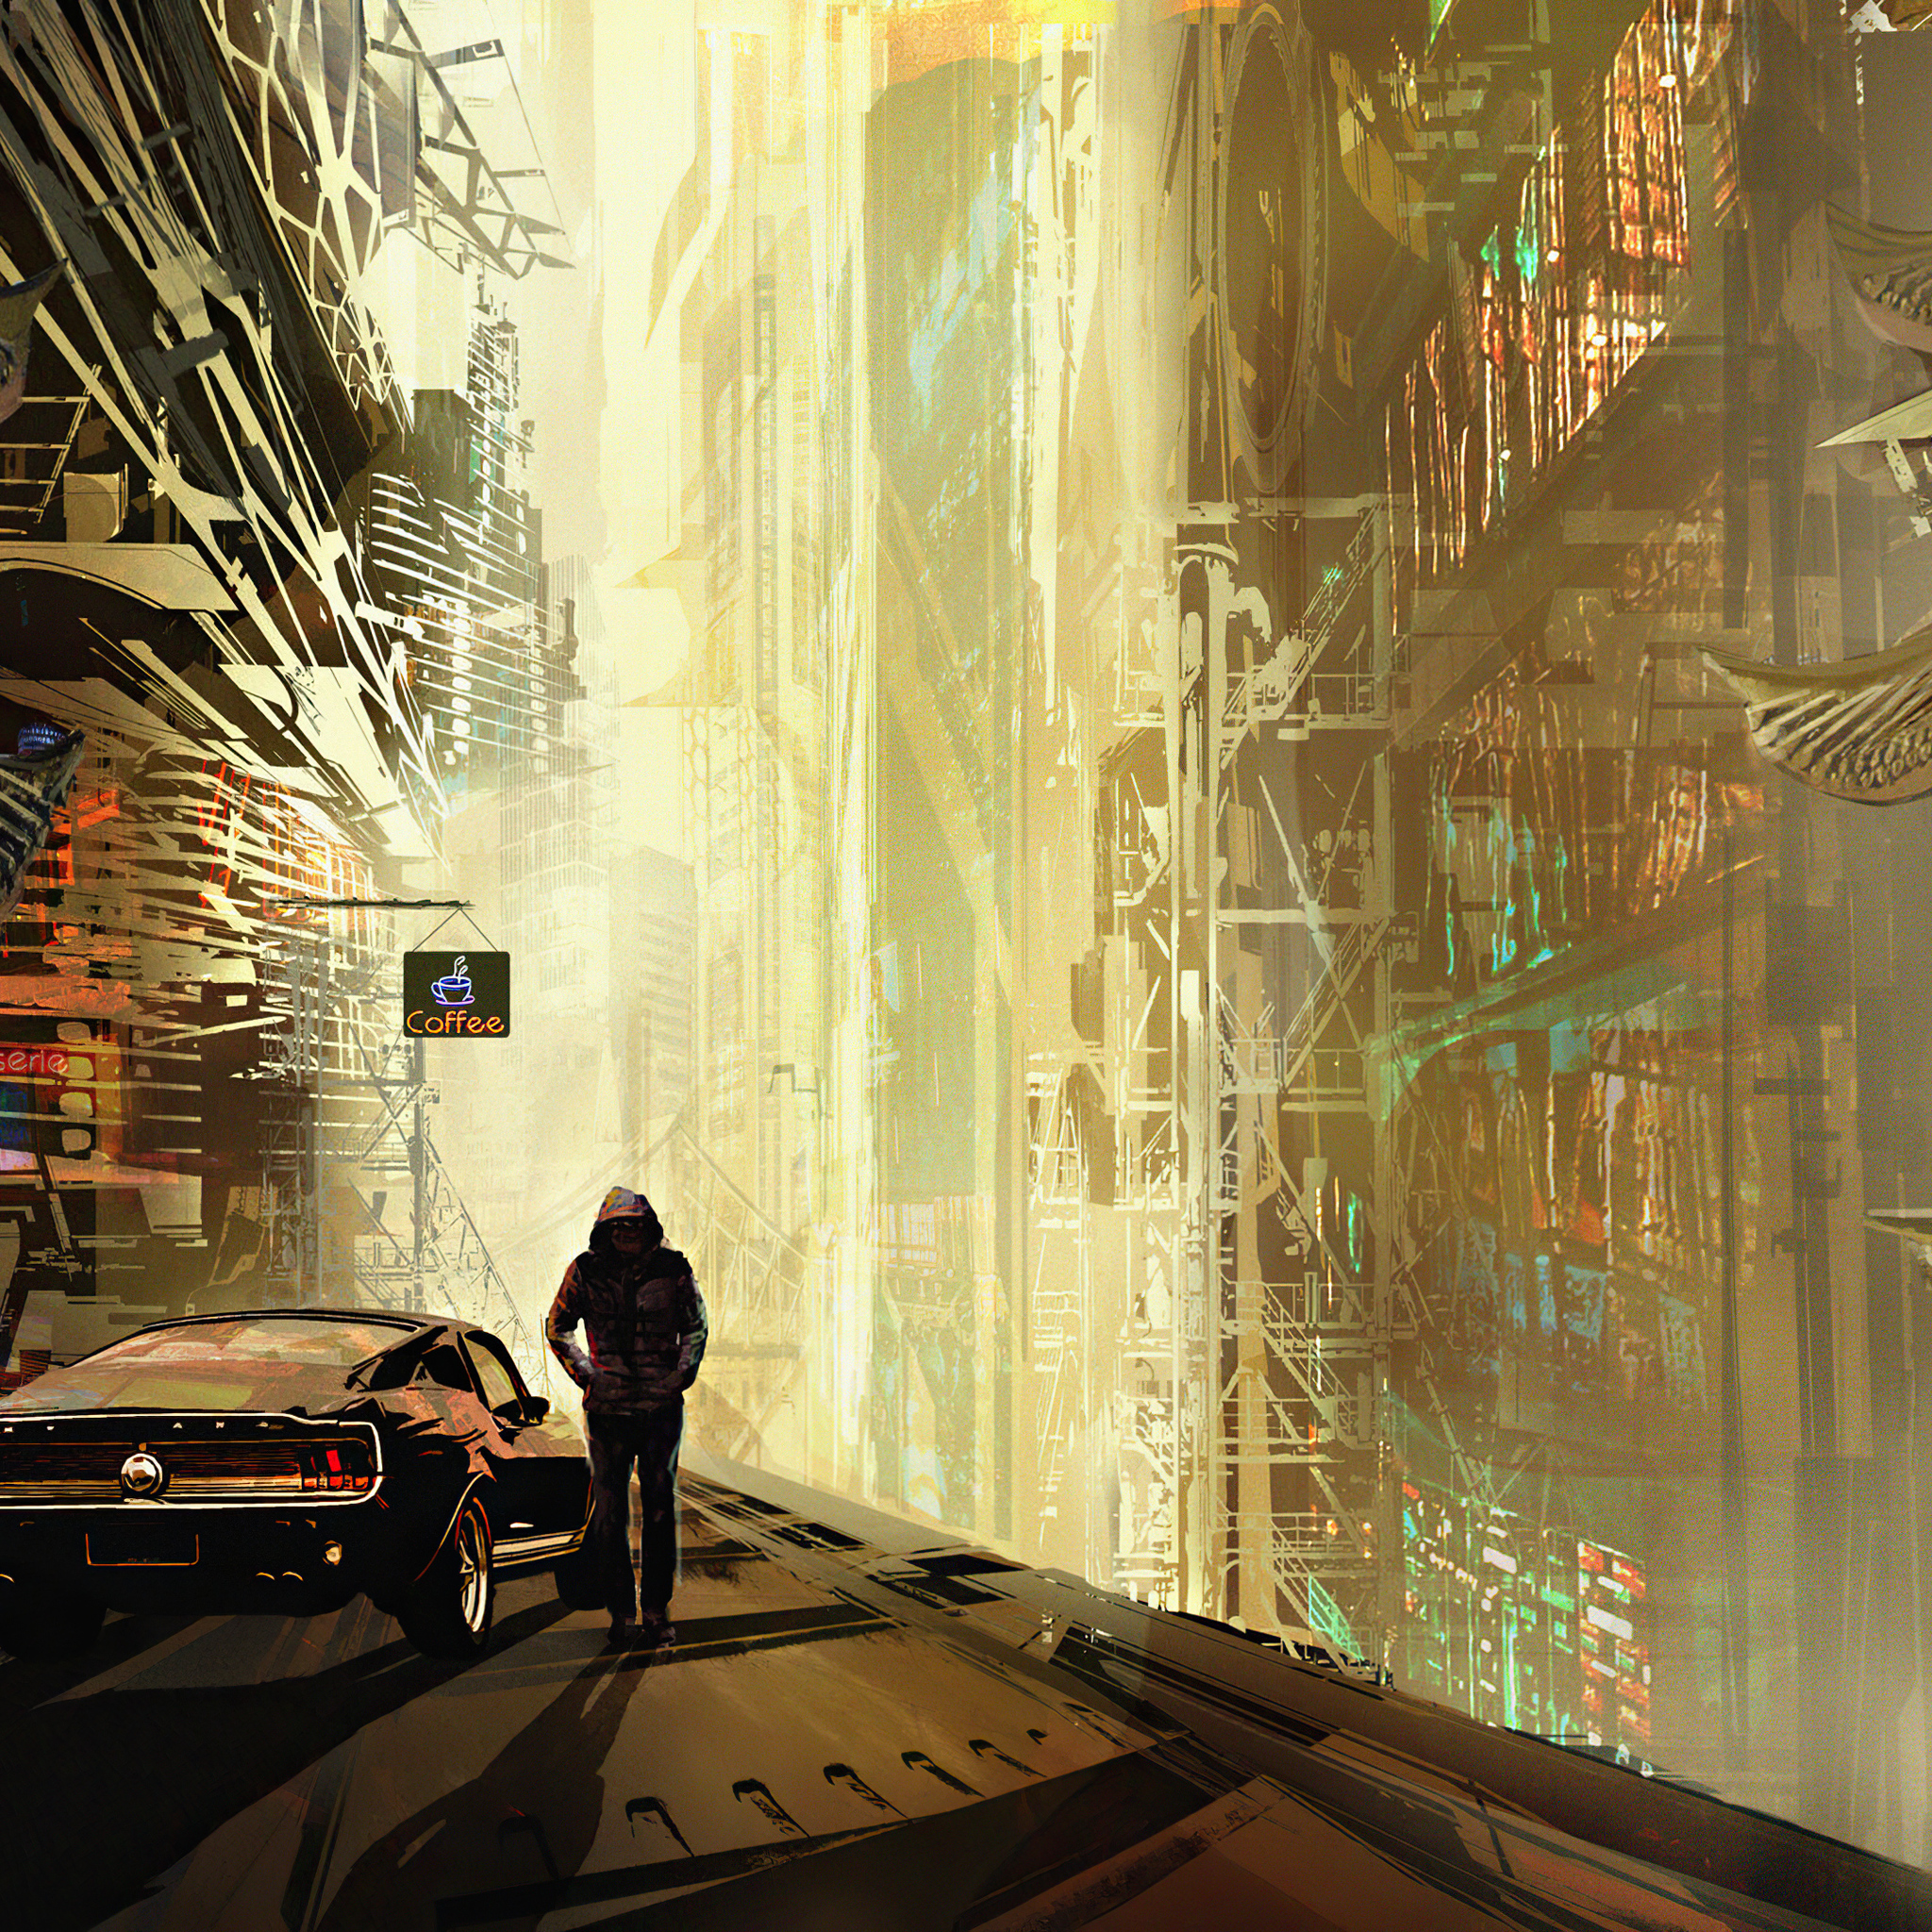 ancient-cyberpunk-futuristic-city-hoodie-boy-4k-3c.jpg